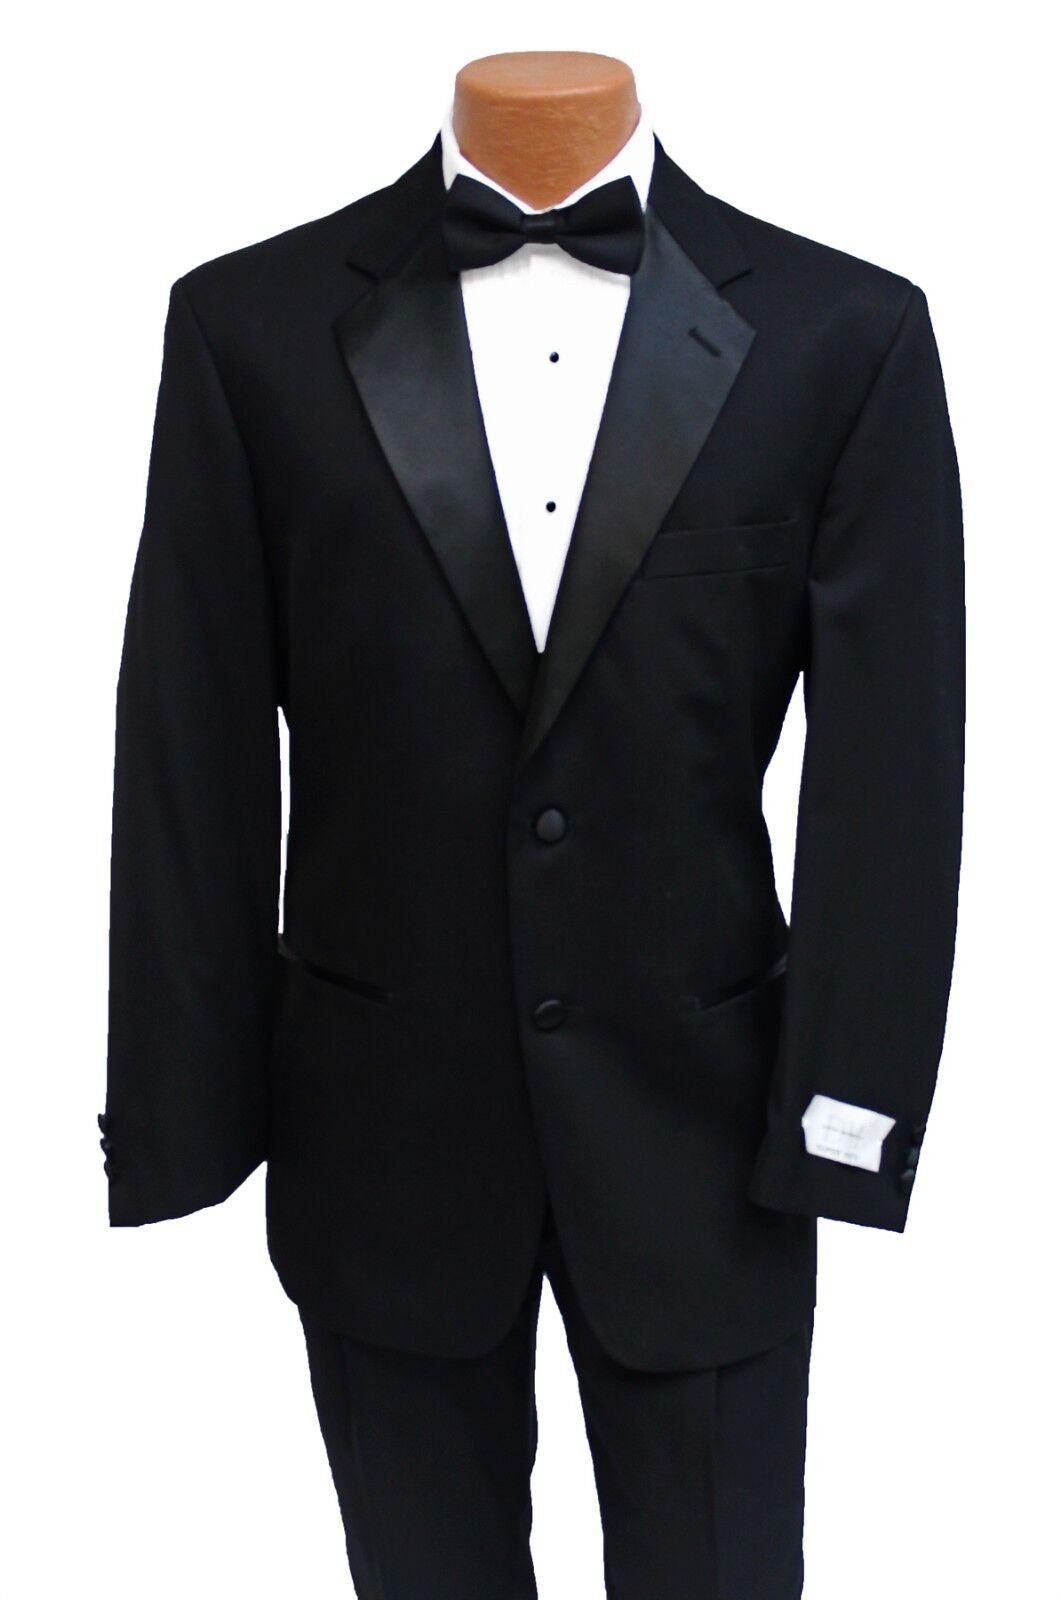 40XL Brand New Devin Michaels Classic 2 Button Notch Lapel Blazer Tuxedo Jacket